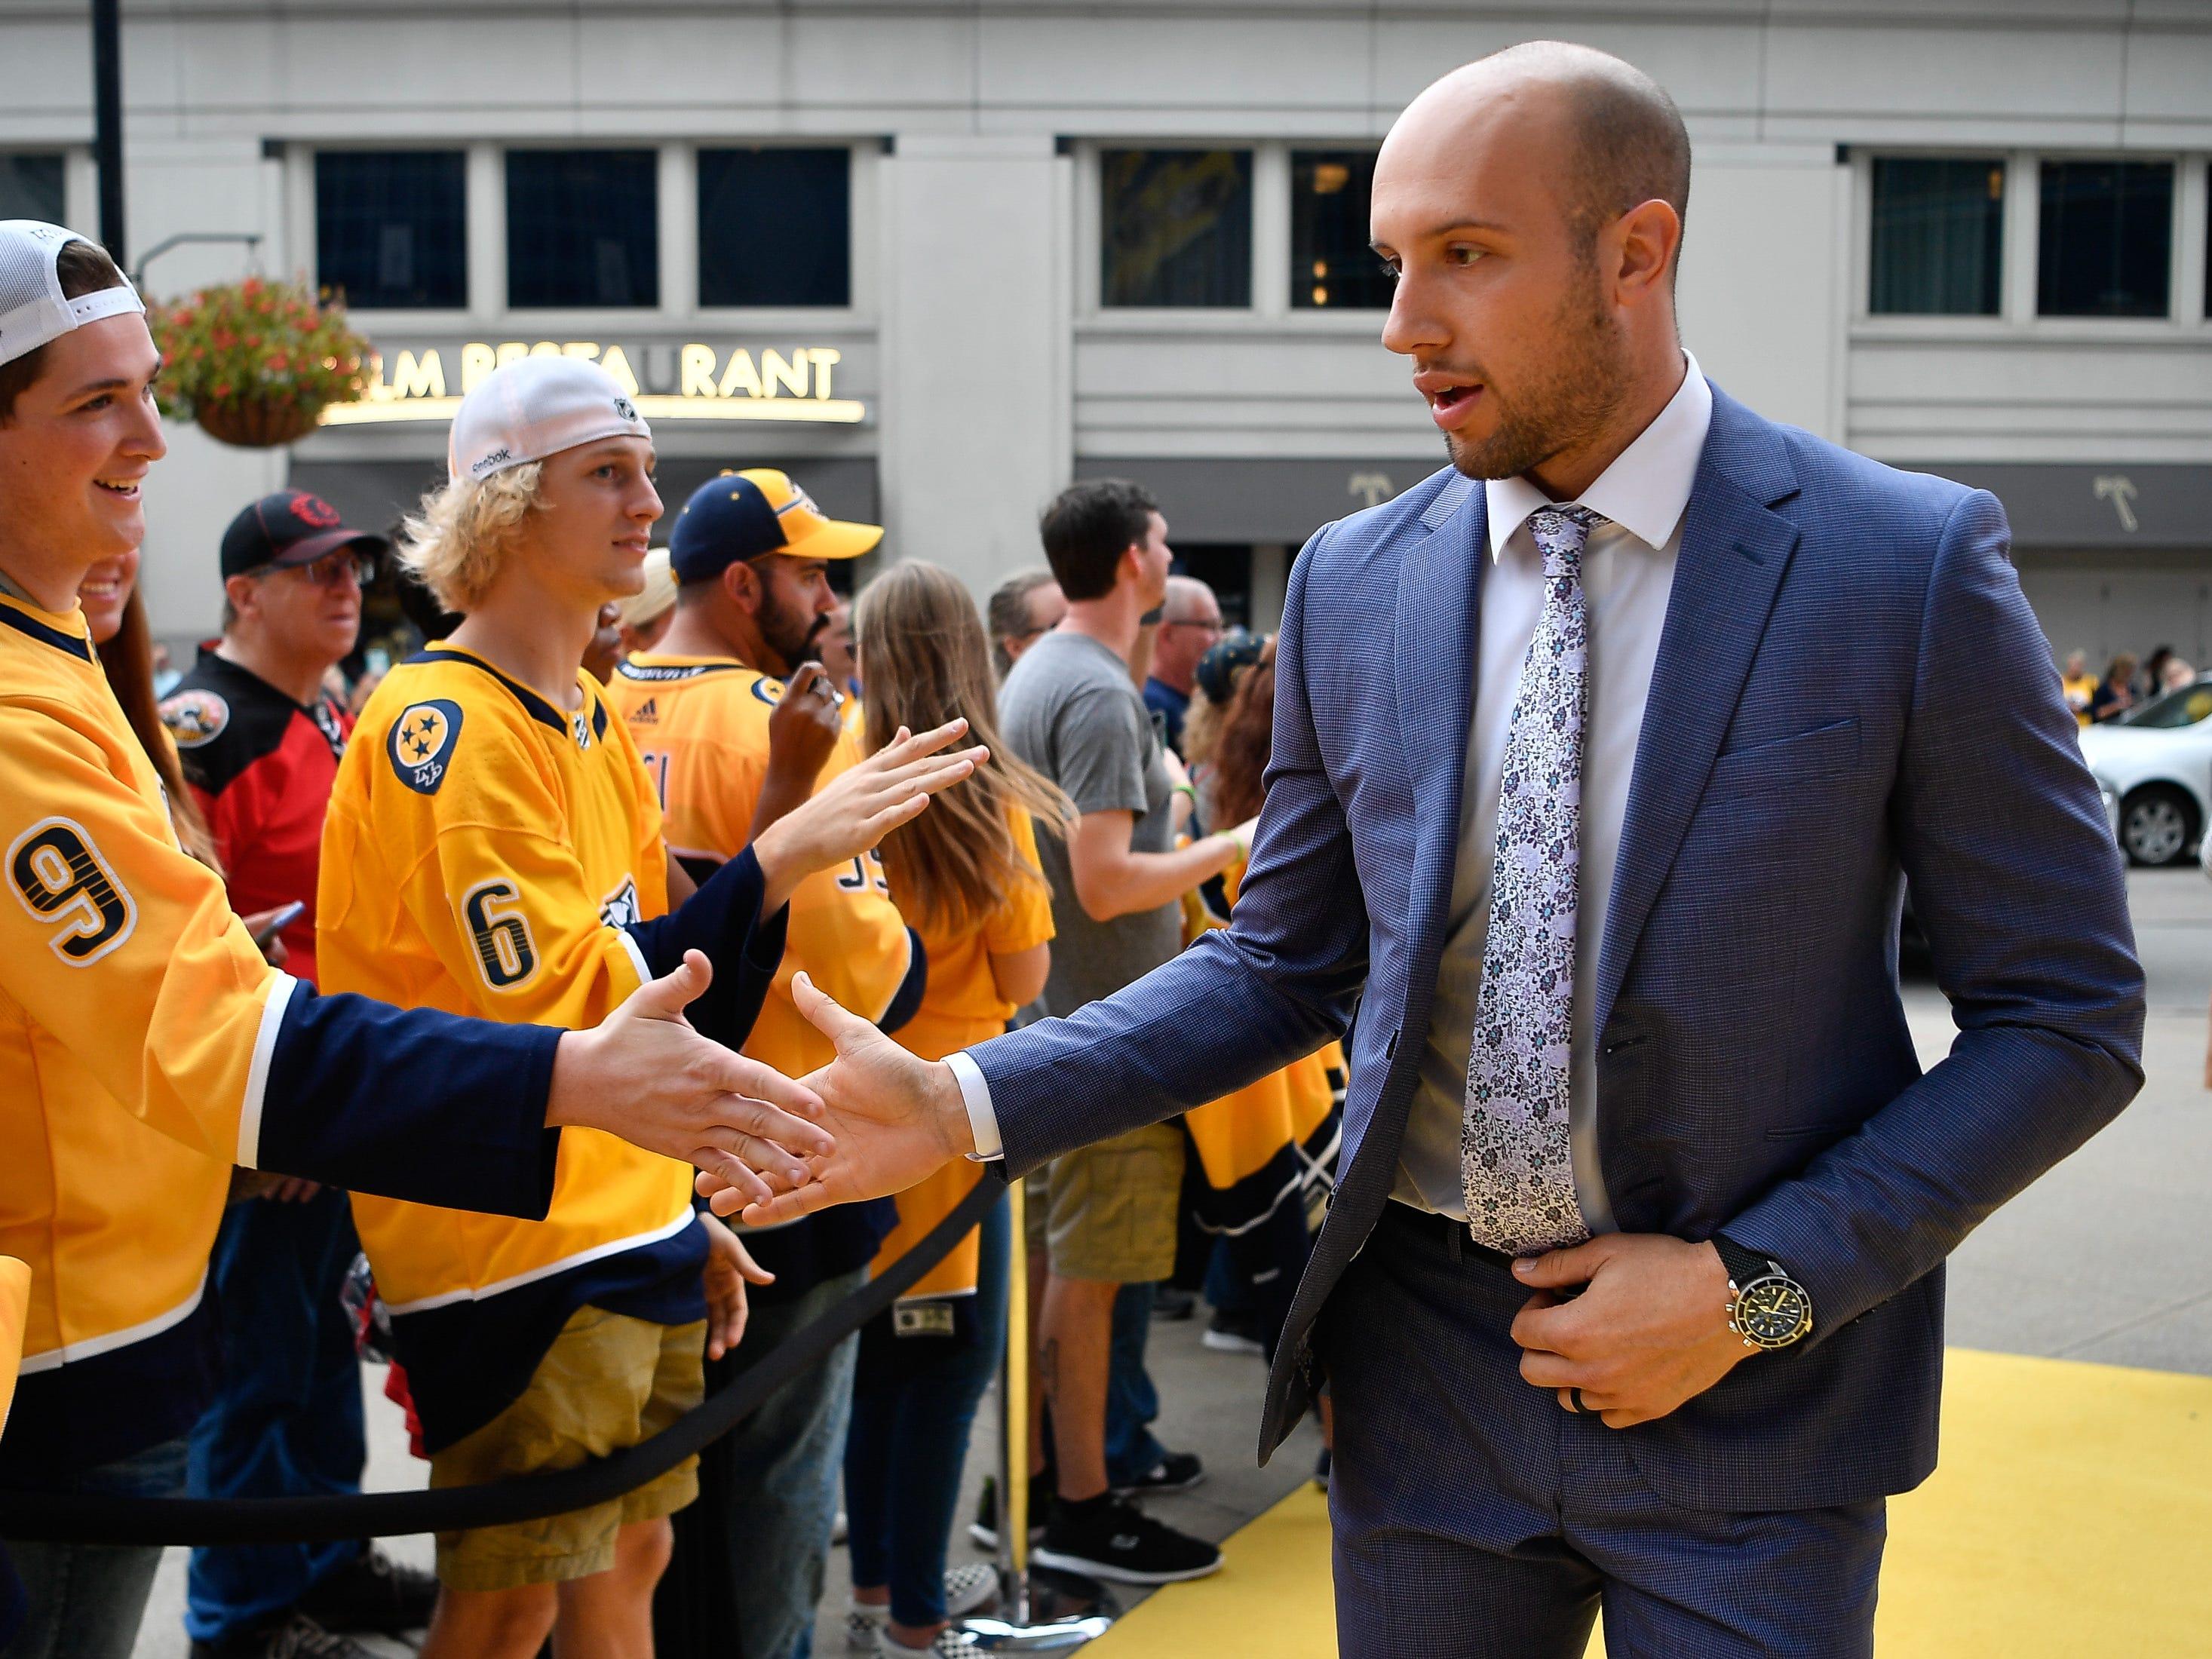 Nashville Predators center Nick Bonino greets fans during the Gold Walk before the home opener at Bridgestone Arena in Nashville, Tenn., Tuesday, Oct. 9, 2018.